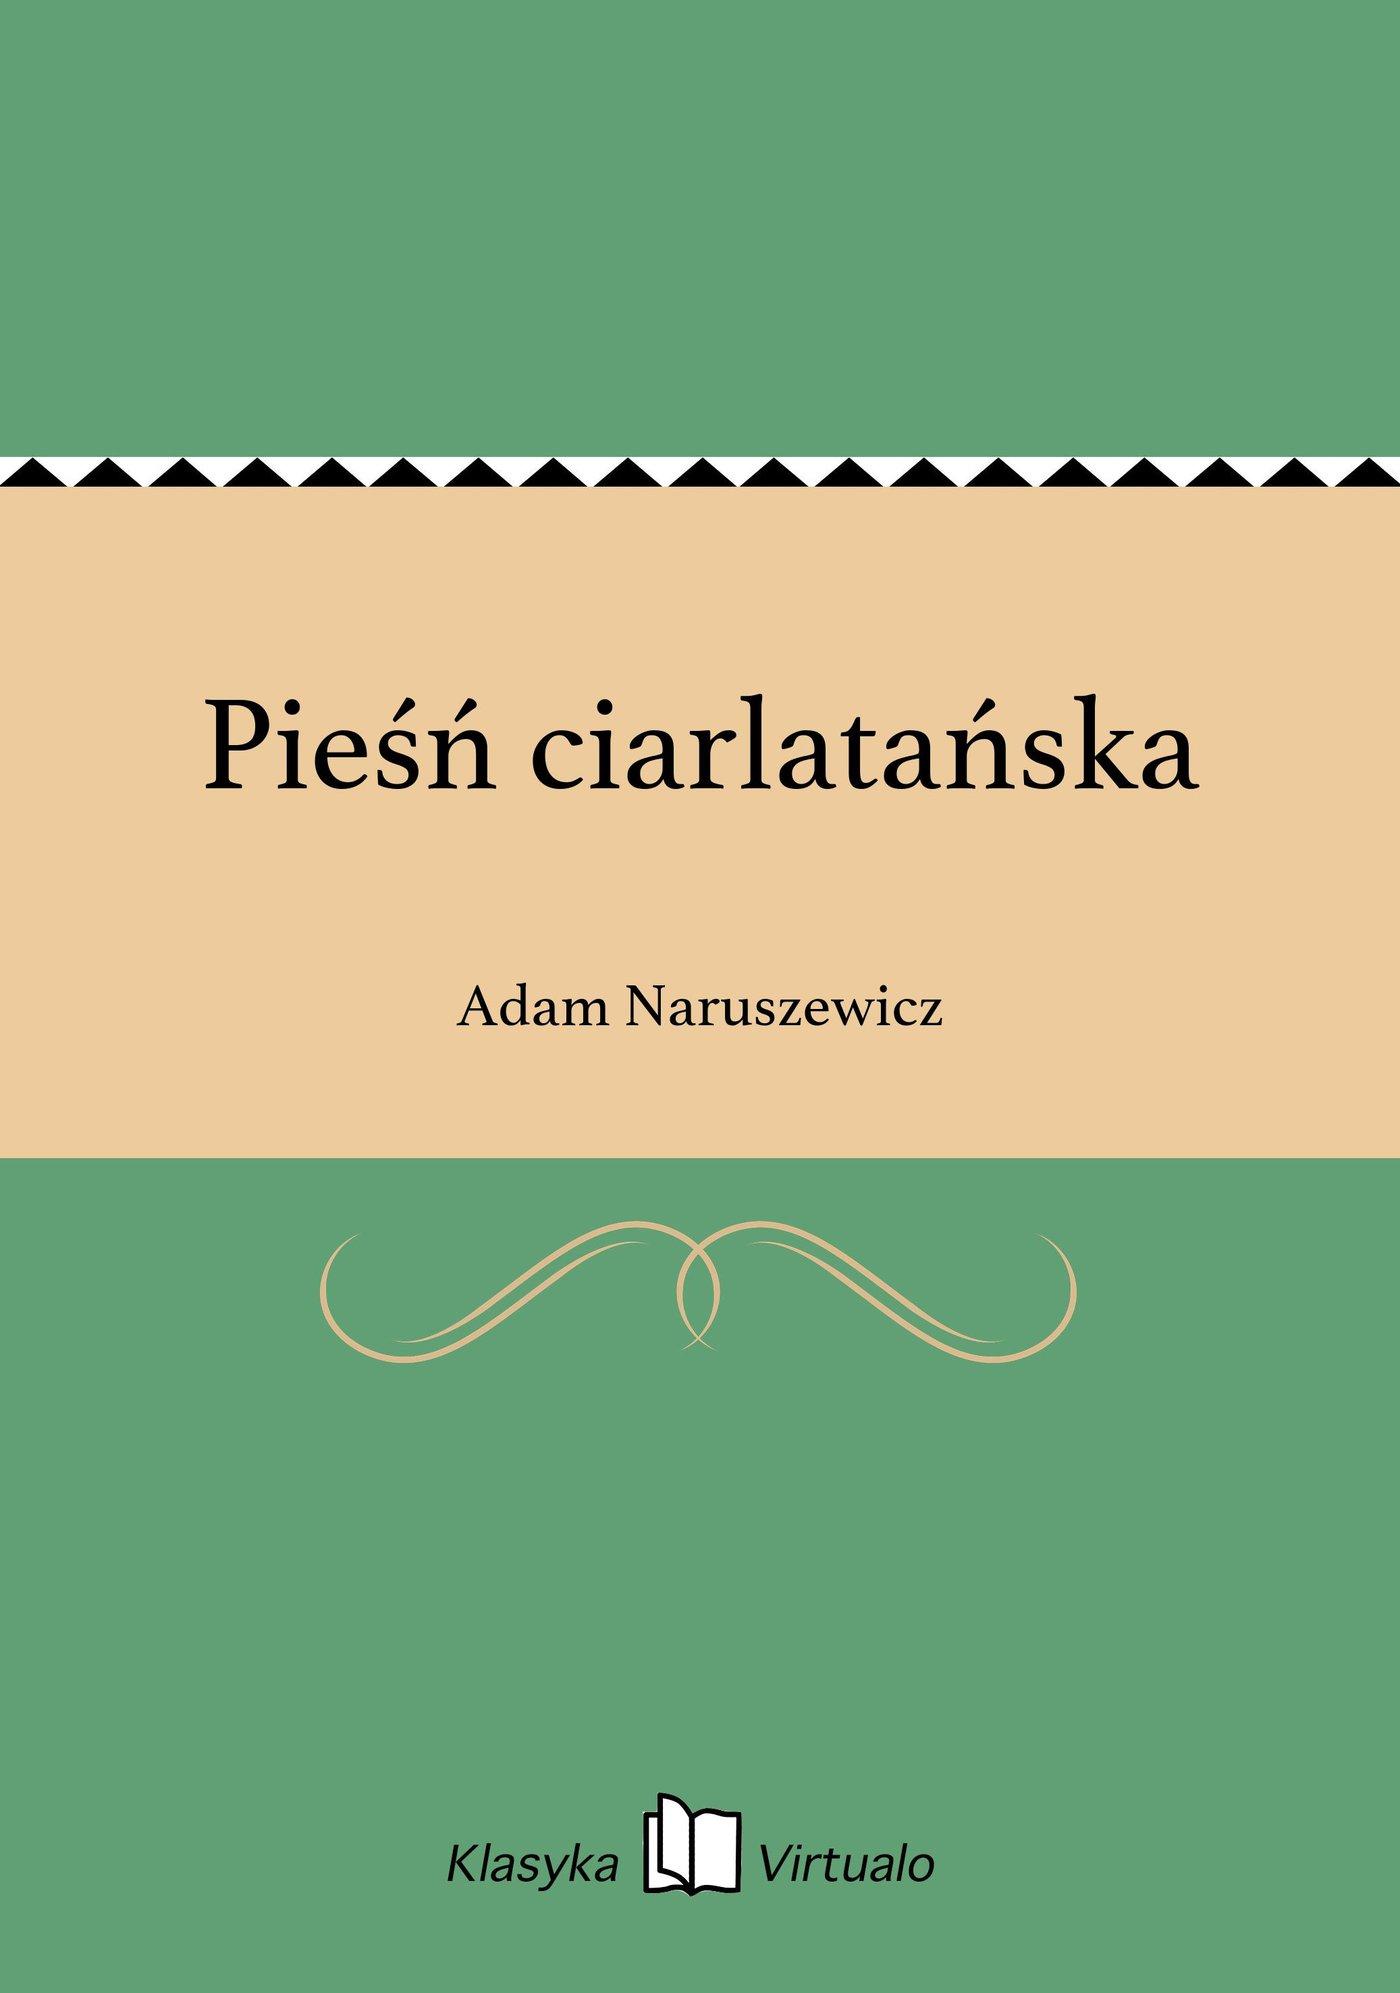 Pieśń ciarlatańska - Ebook (Książka na Kindle) do pobrania w formacie MOBI